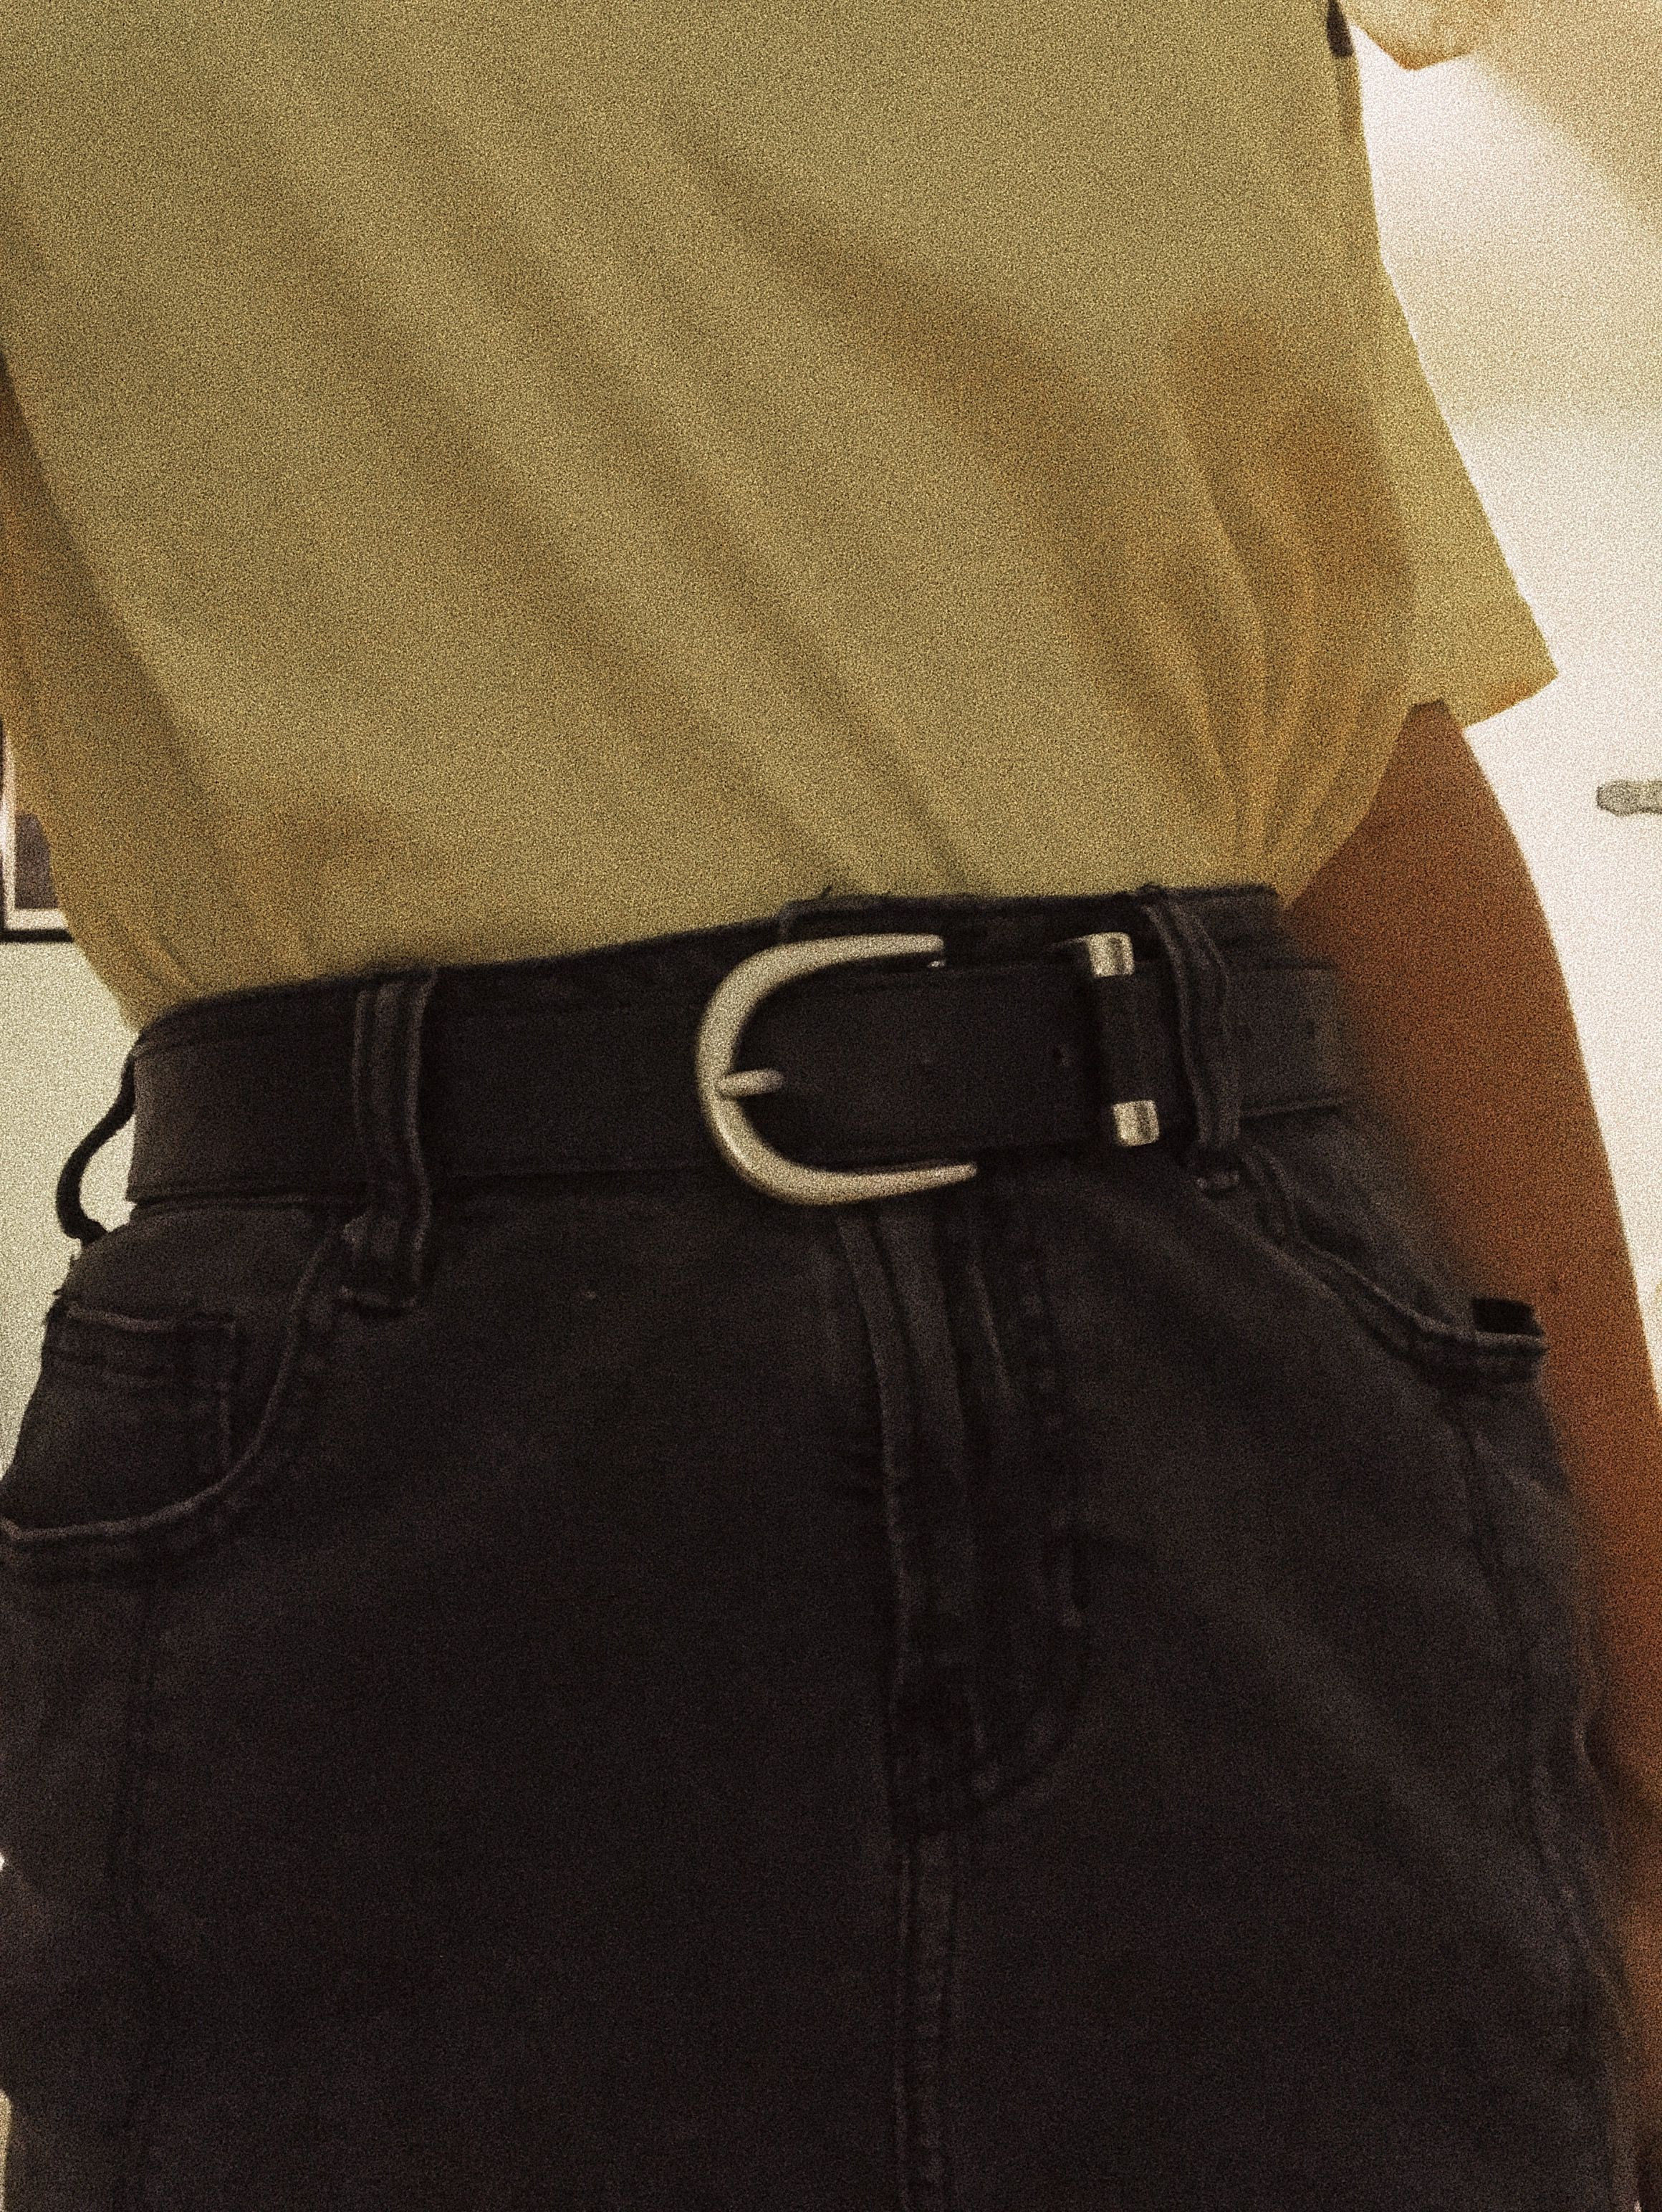 Trendy Yellow Edgy Aesthetic. Belt, Black, 90s Aesthetic